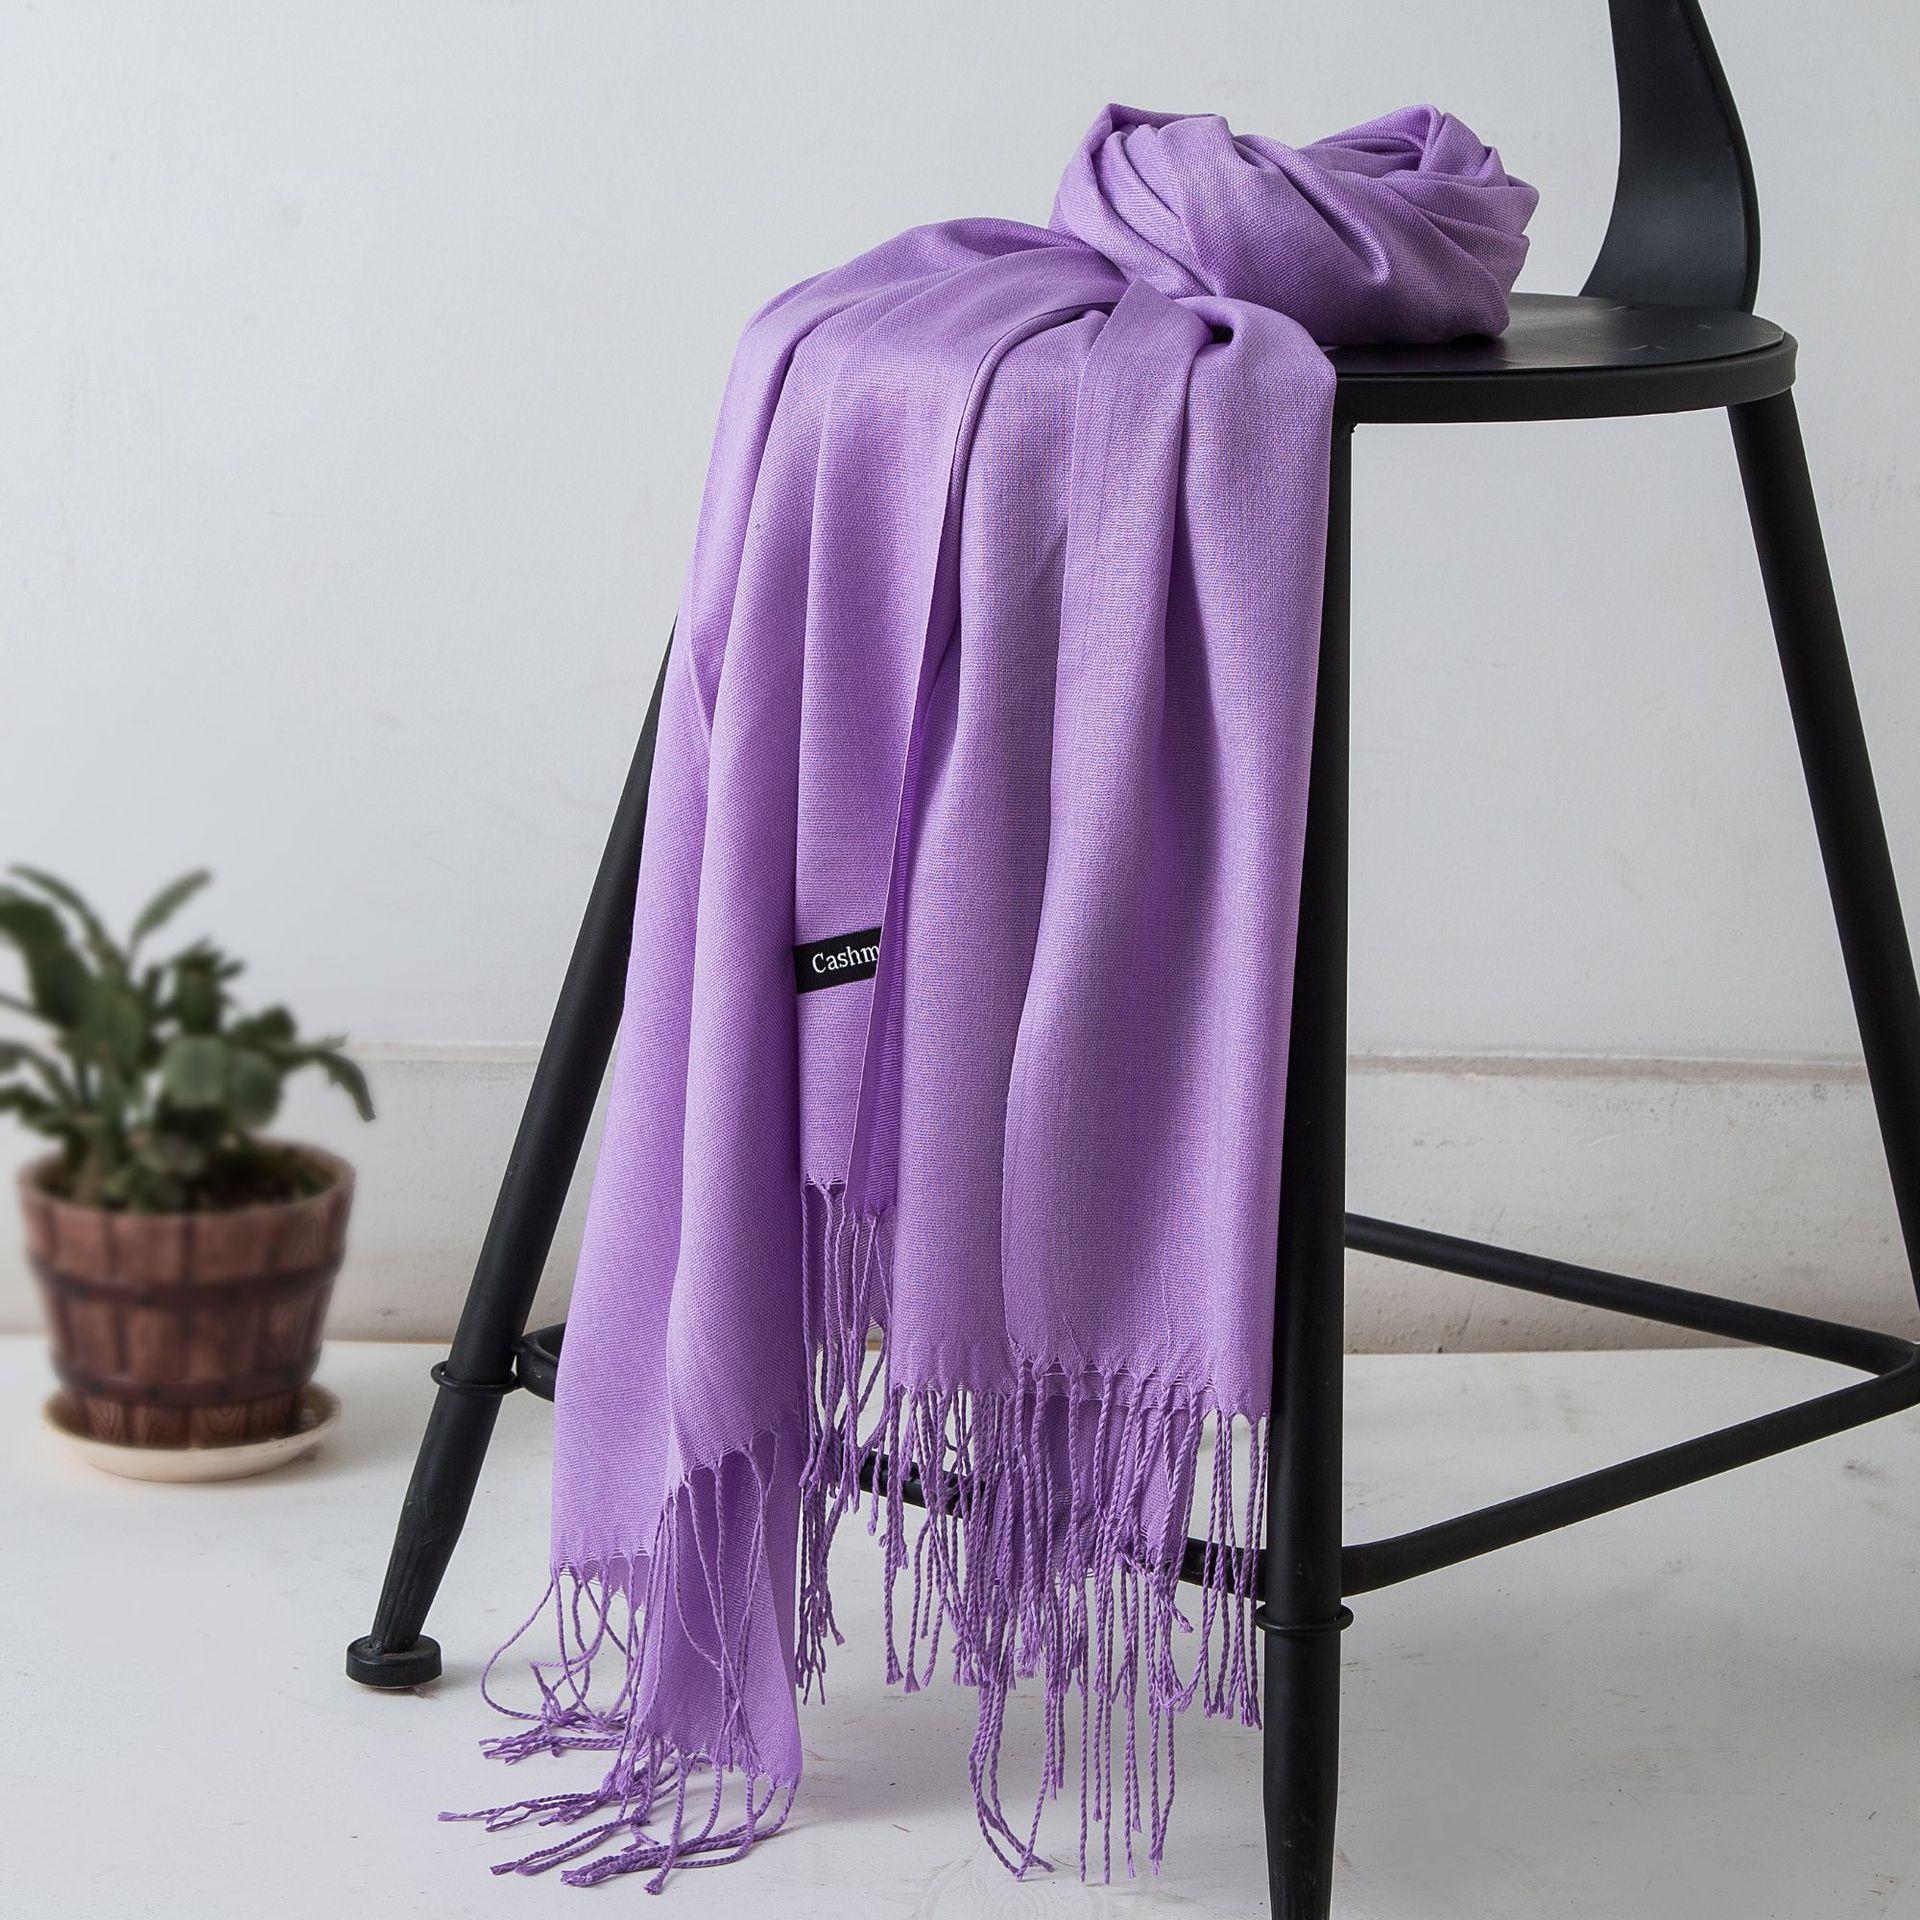 2019 Luxury Solid Women Pashmina Scarf Cashmere Shawls Wraps Tassel Bandana Scarves Lady Warm Winter Hijab Female Bufanda